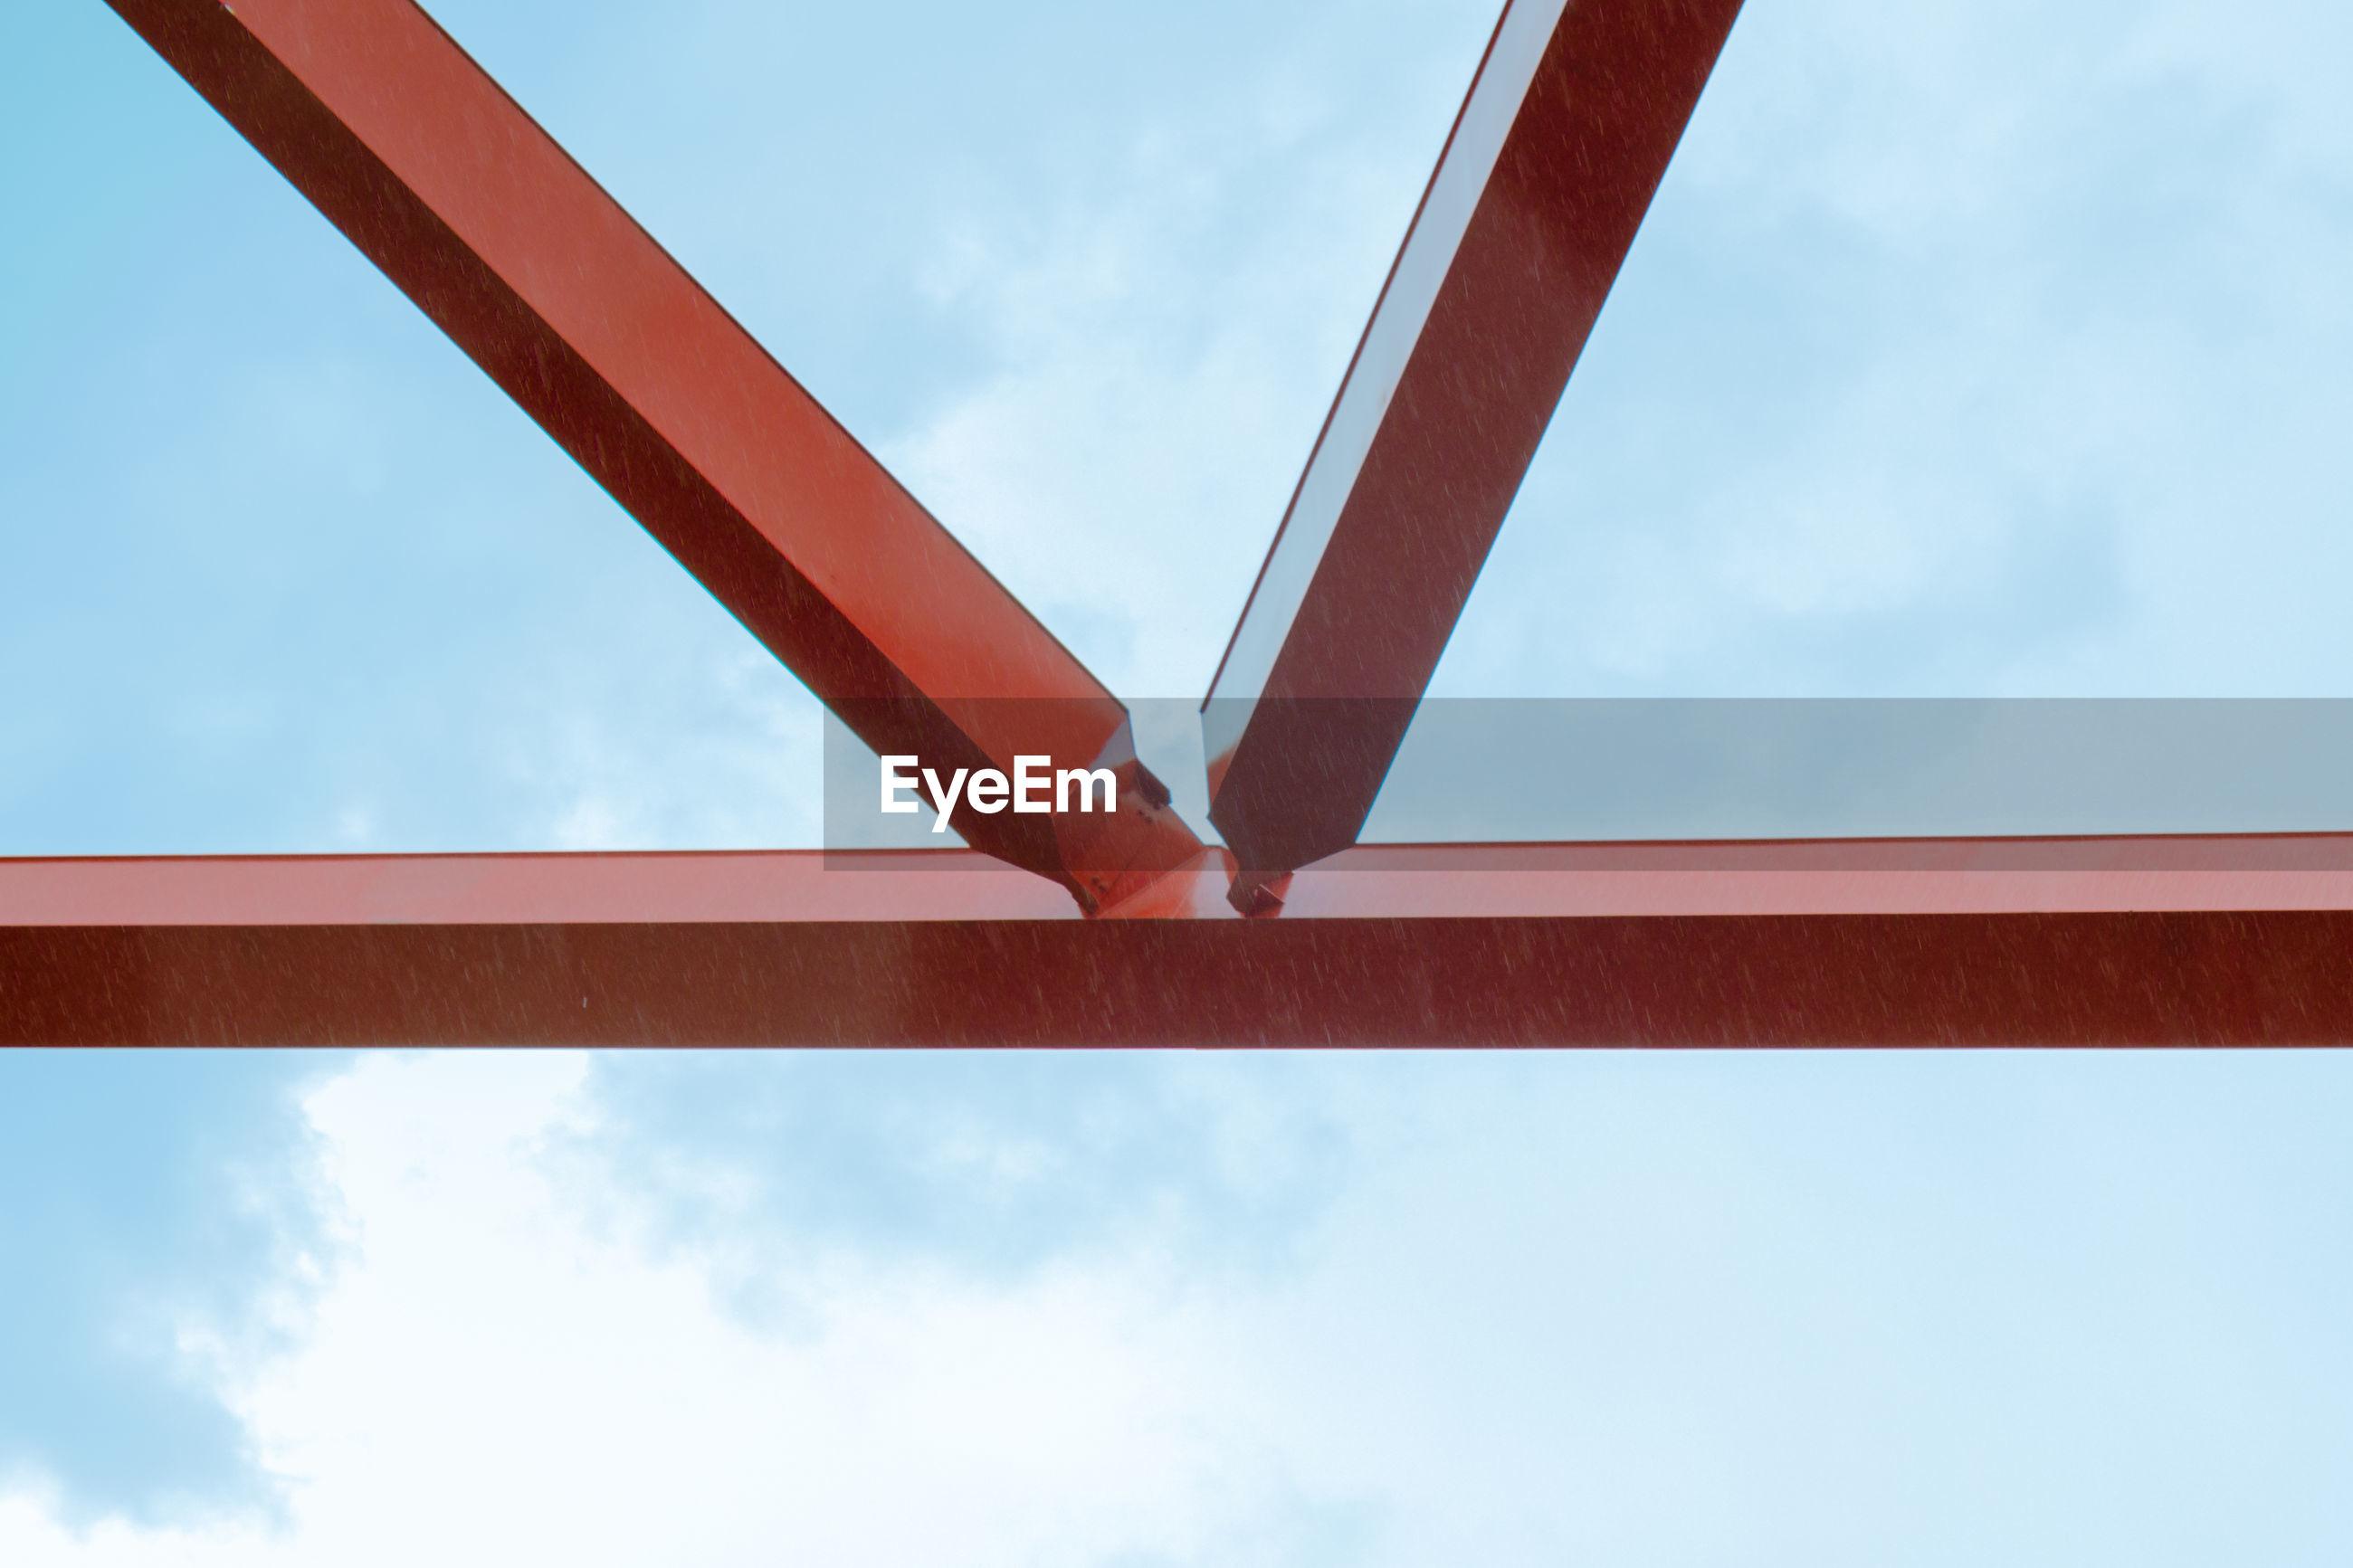 LOW ANGLE VIEW OF METAL BRIDGE AGAINST SKY